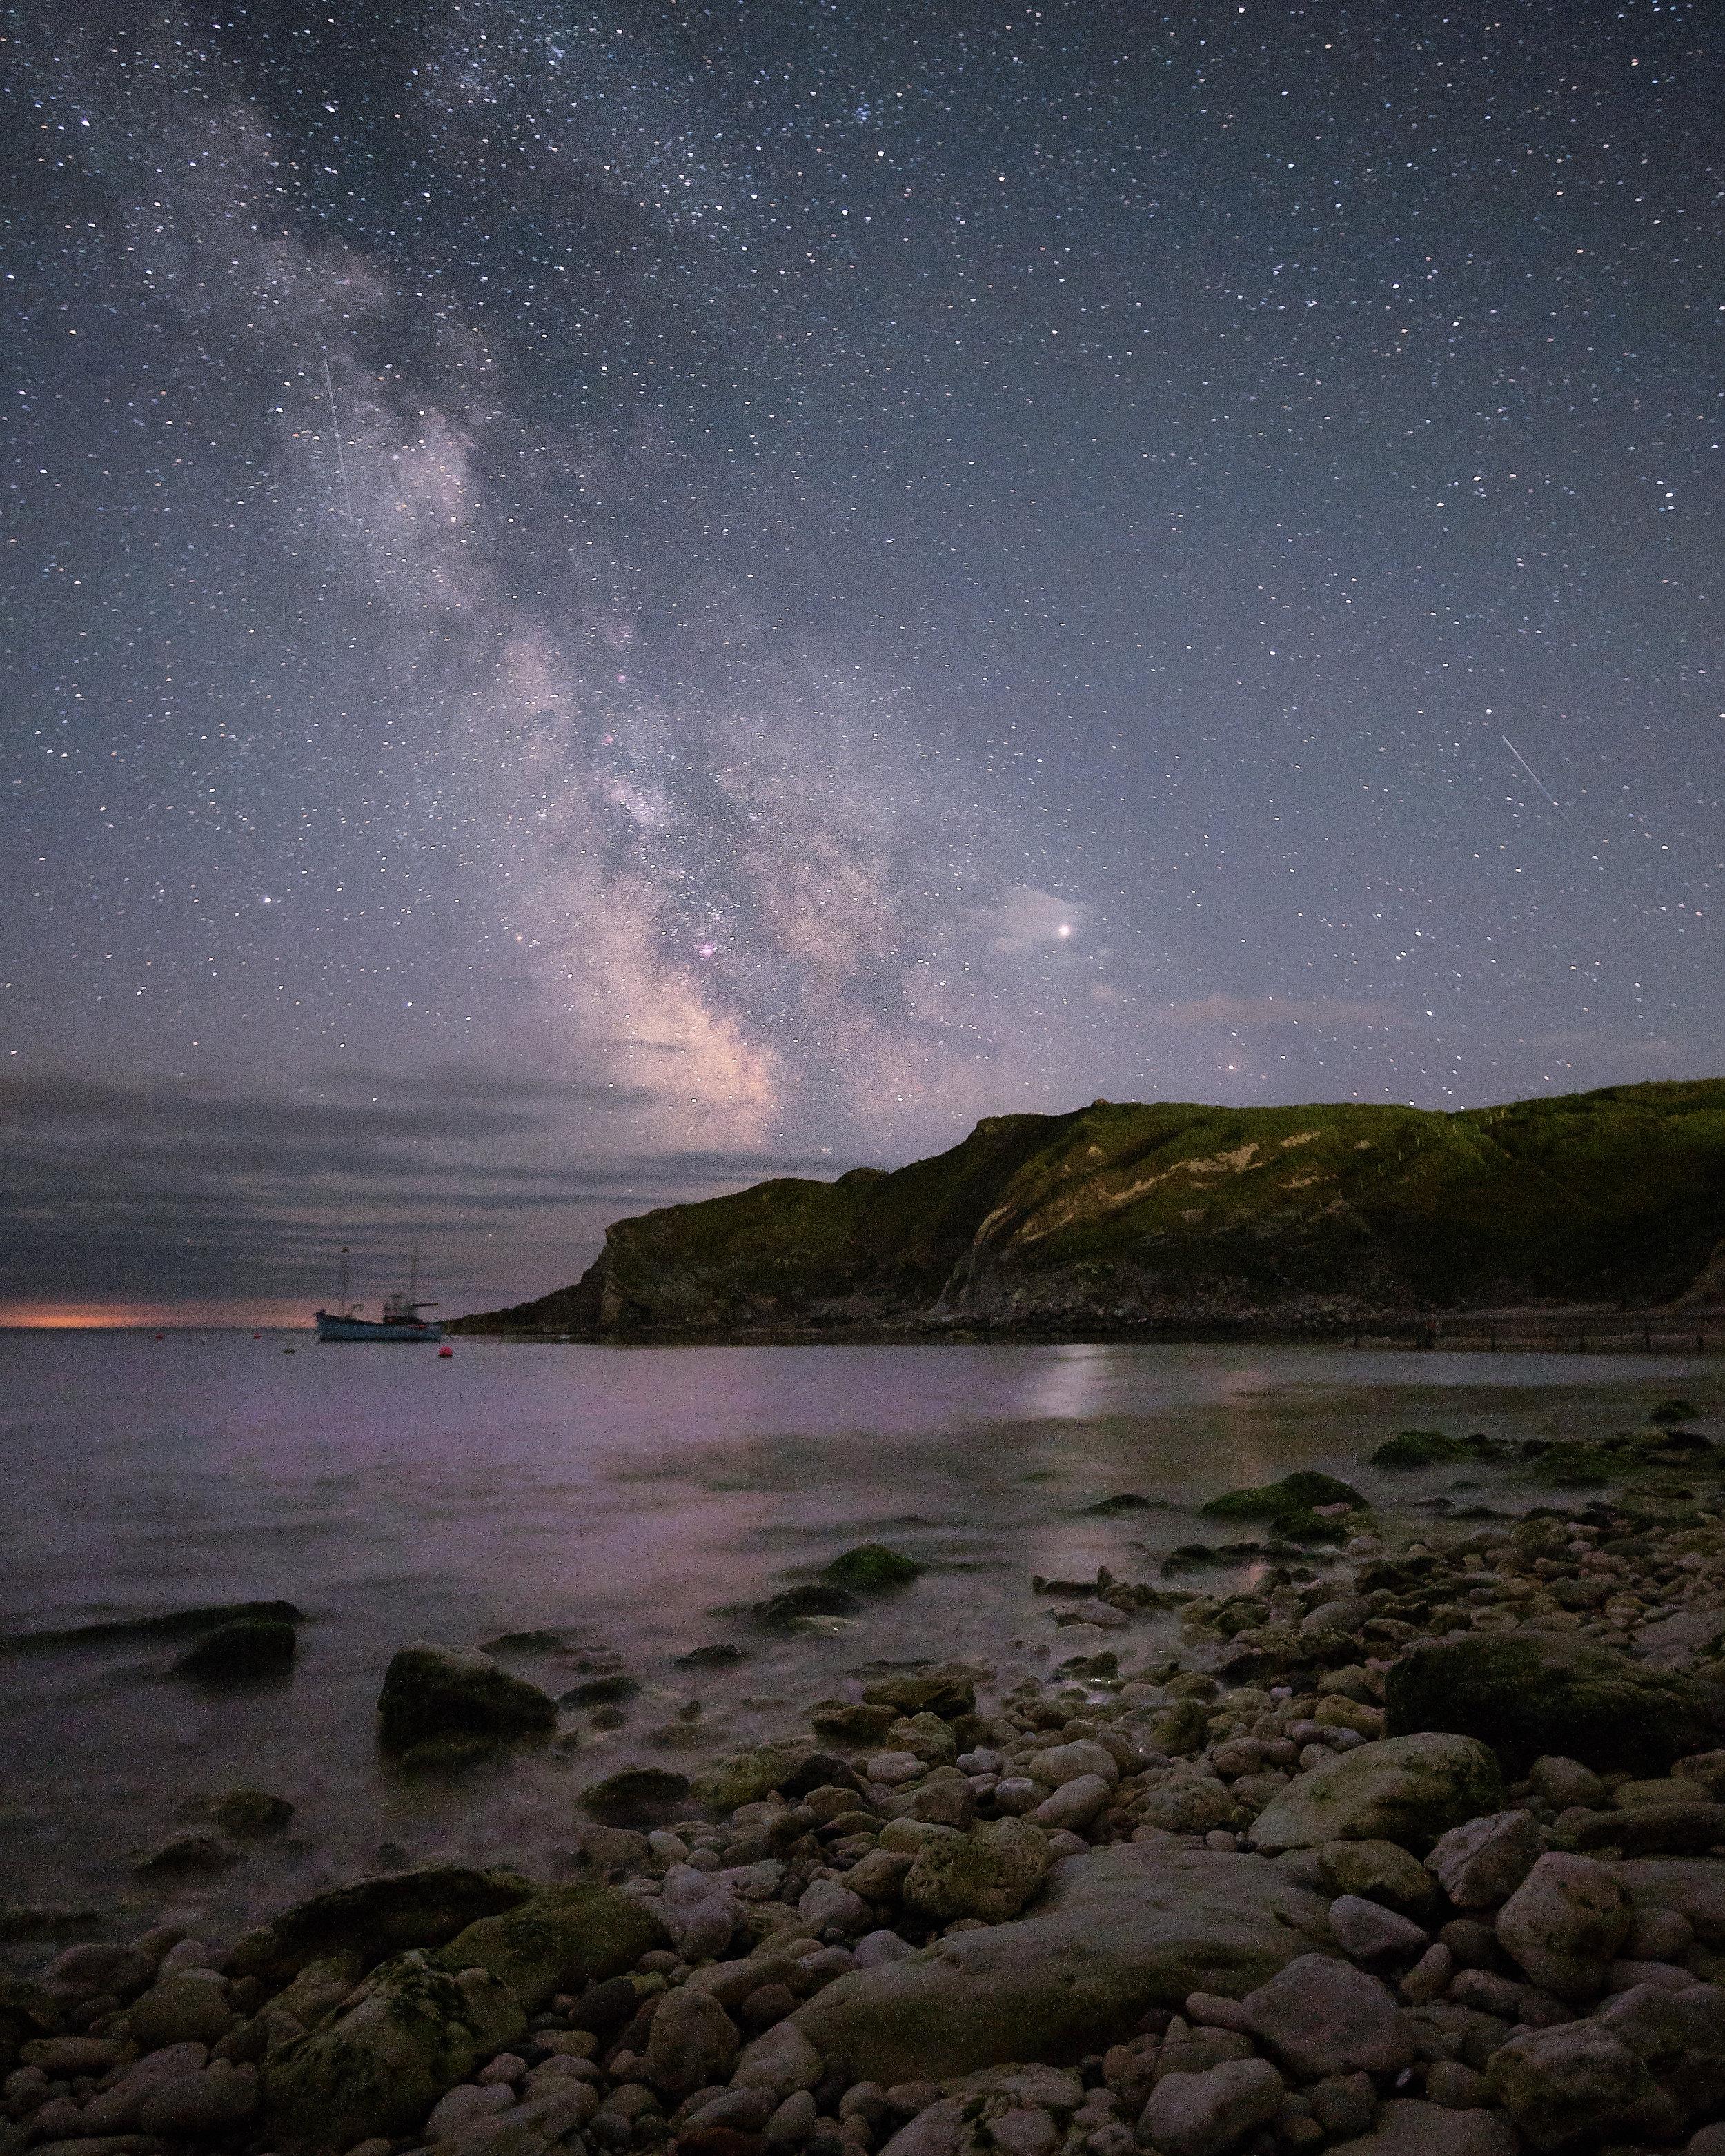 The Milky Way over Lulworth Cove - Dorset